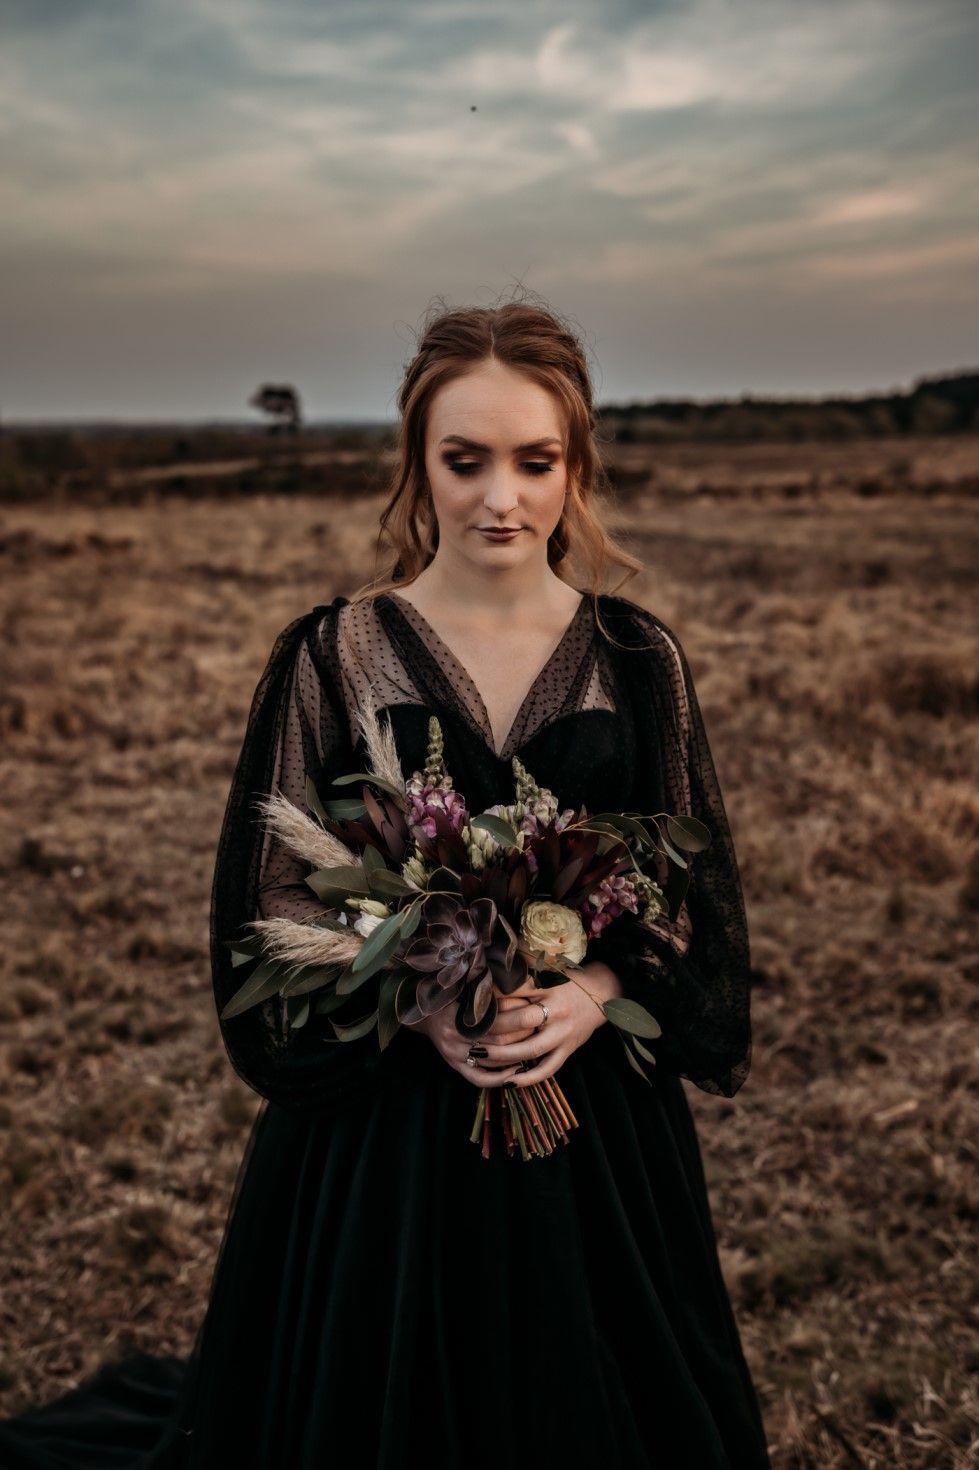 Gothic Wedding Flowers Black Wedding Dress Elope Wedding Alternative Wedding Inspiration Gothic Wedding [ 1470 x 979 Pixel ]